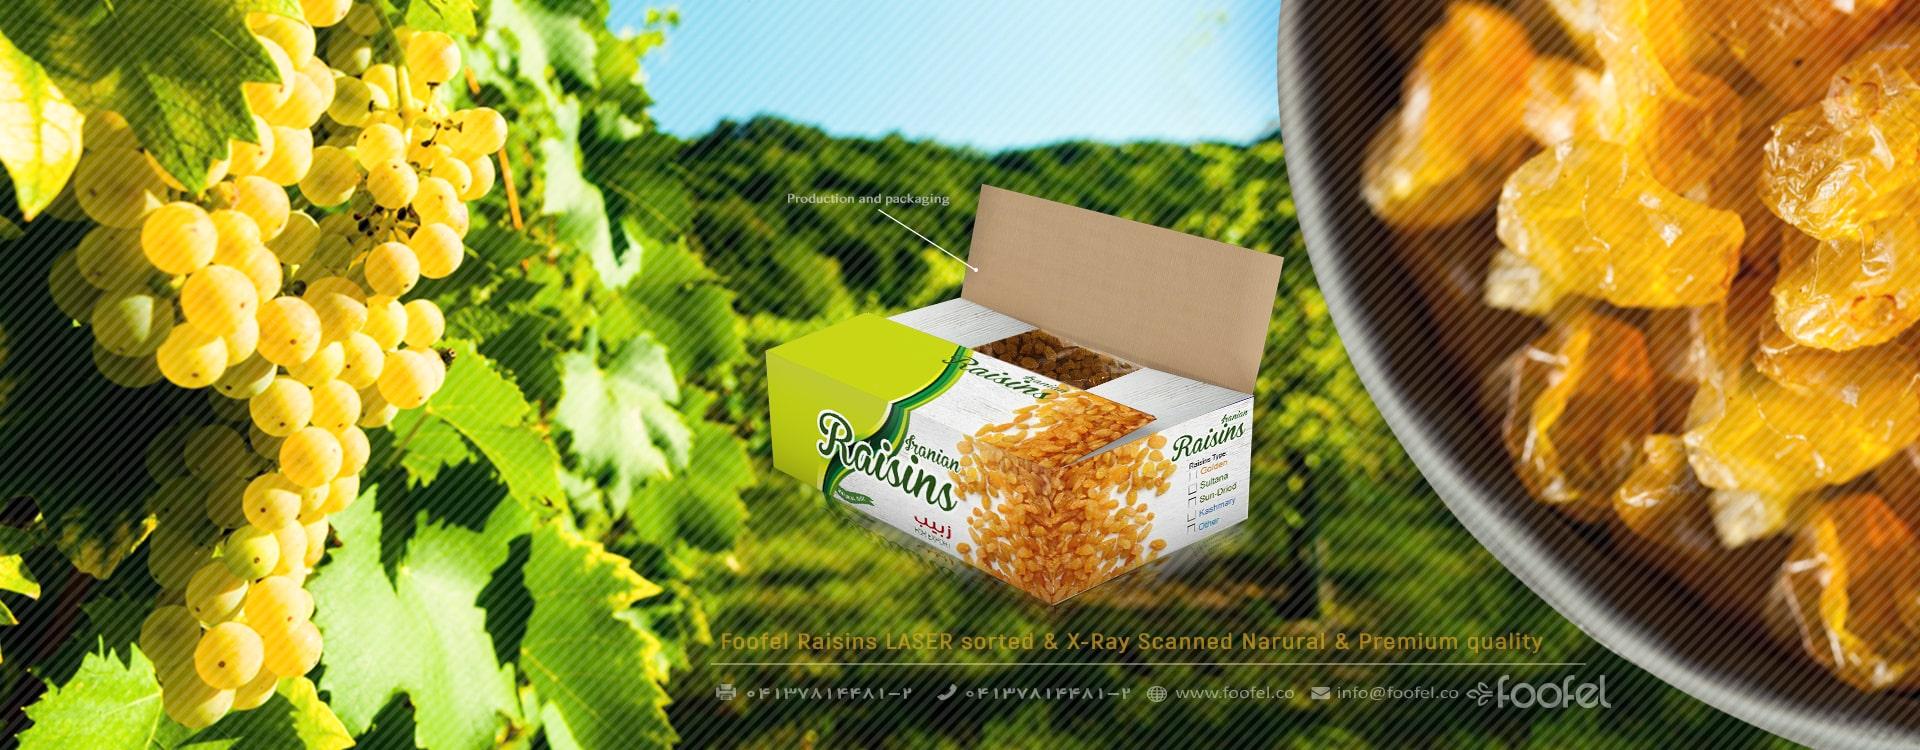 iranian raisins،foofel